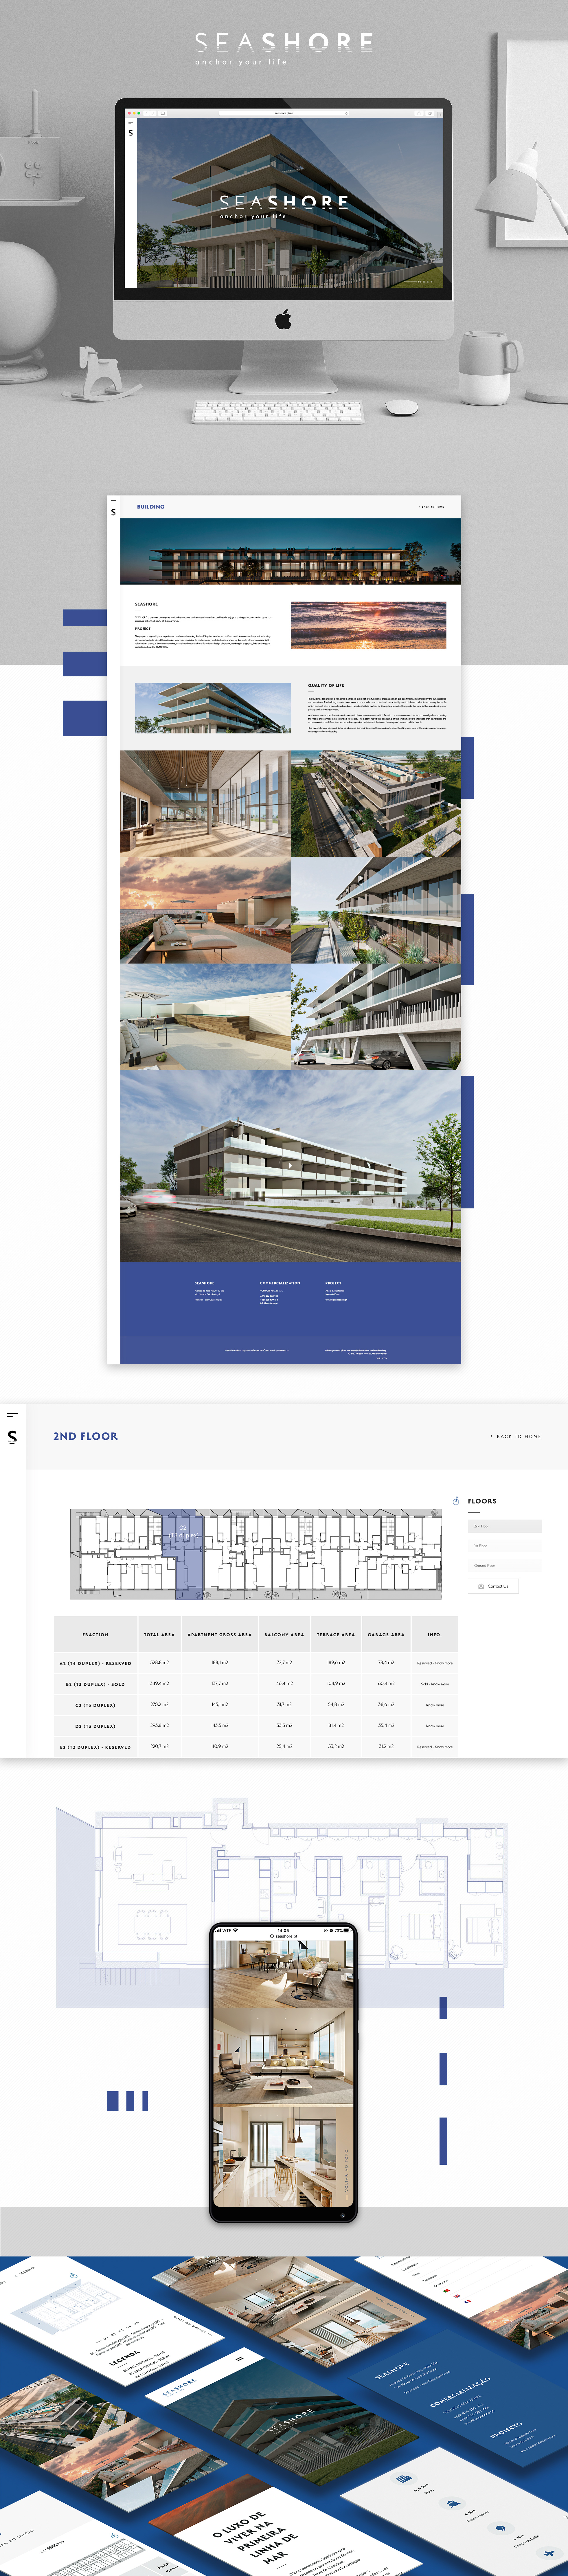 Website Seashore